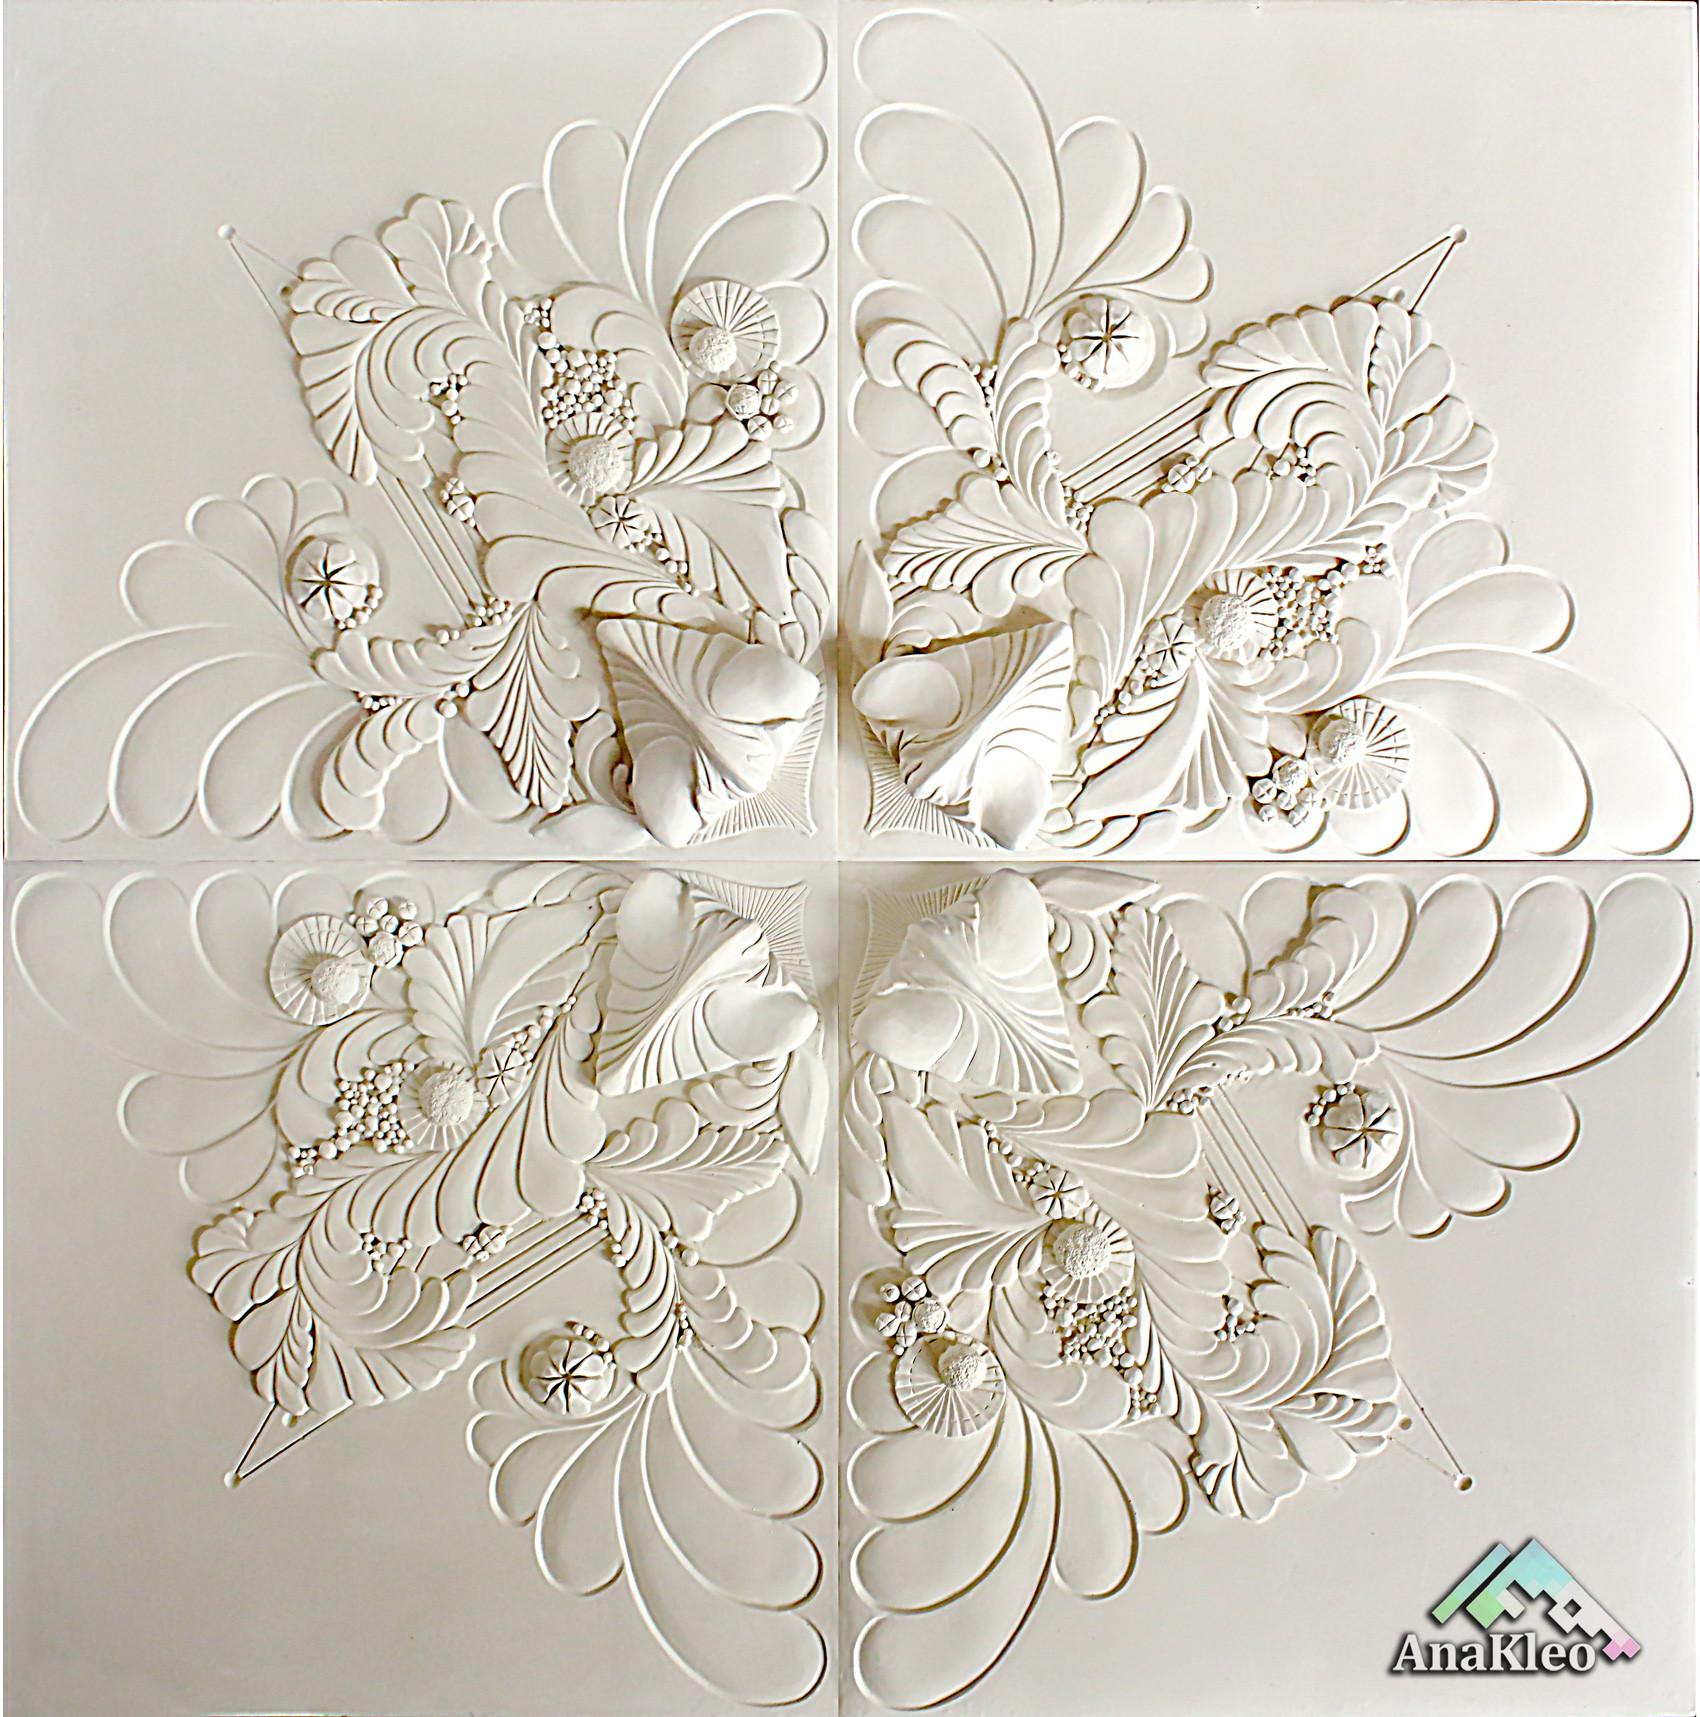 romantique-for-panels-art-wall-decor-bas